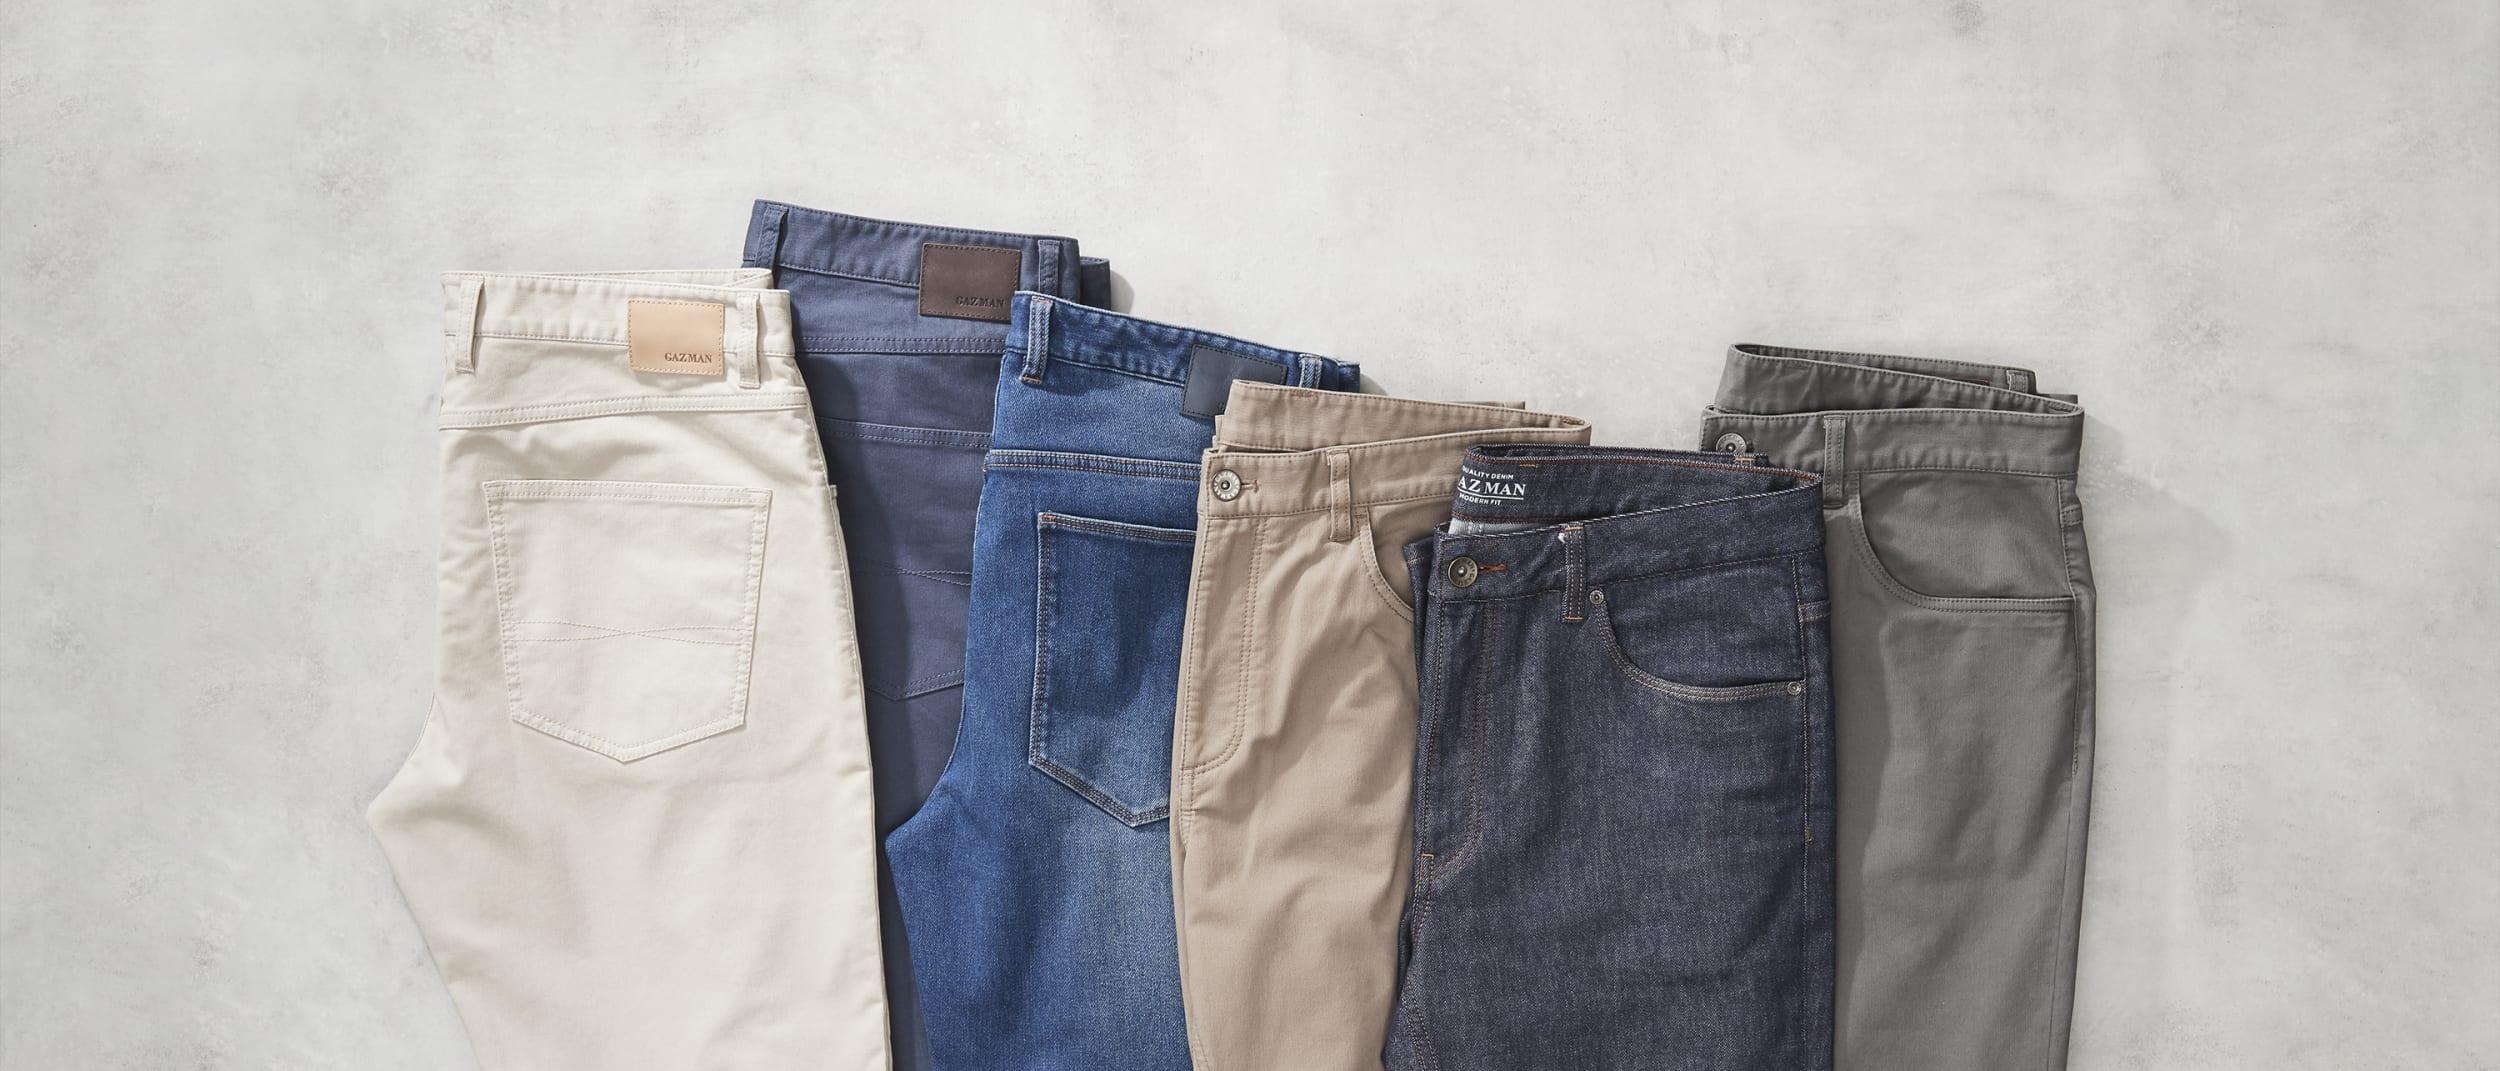 GAZMAN: Winter Sale - $69 Denim and $59 Bedford Cord pants